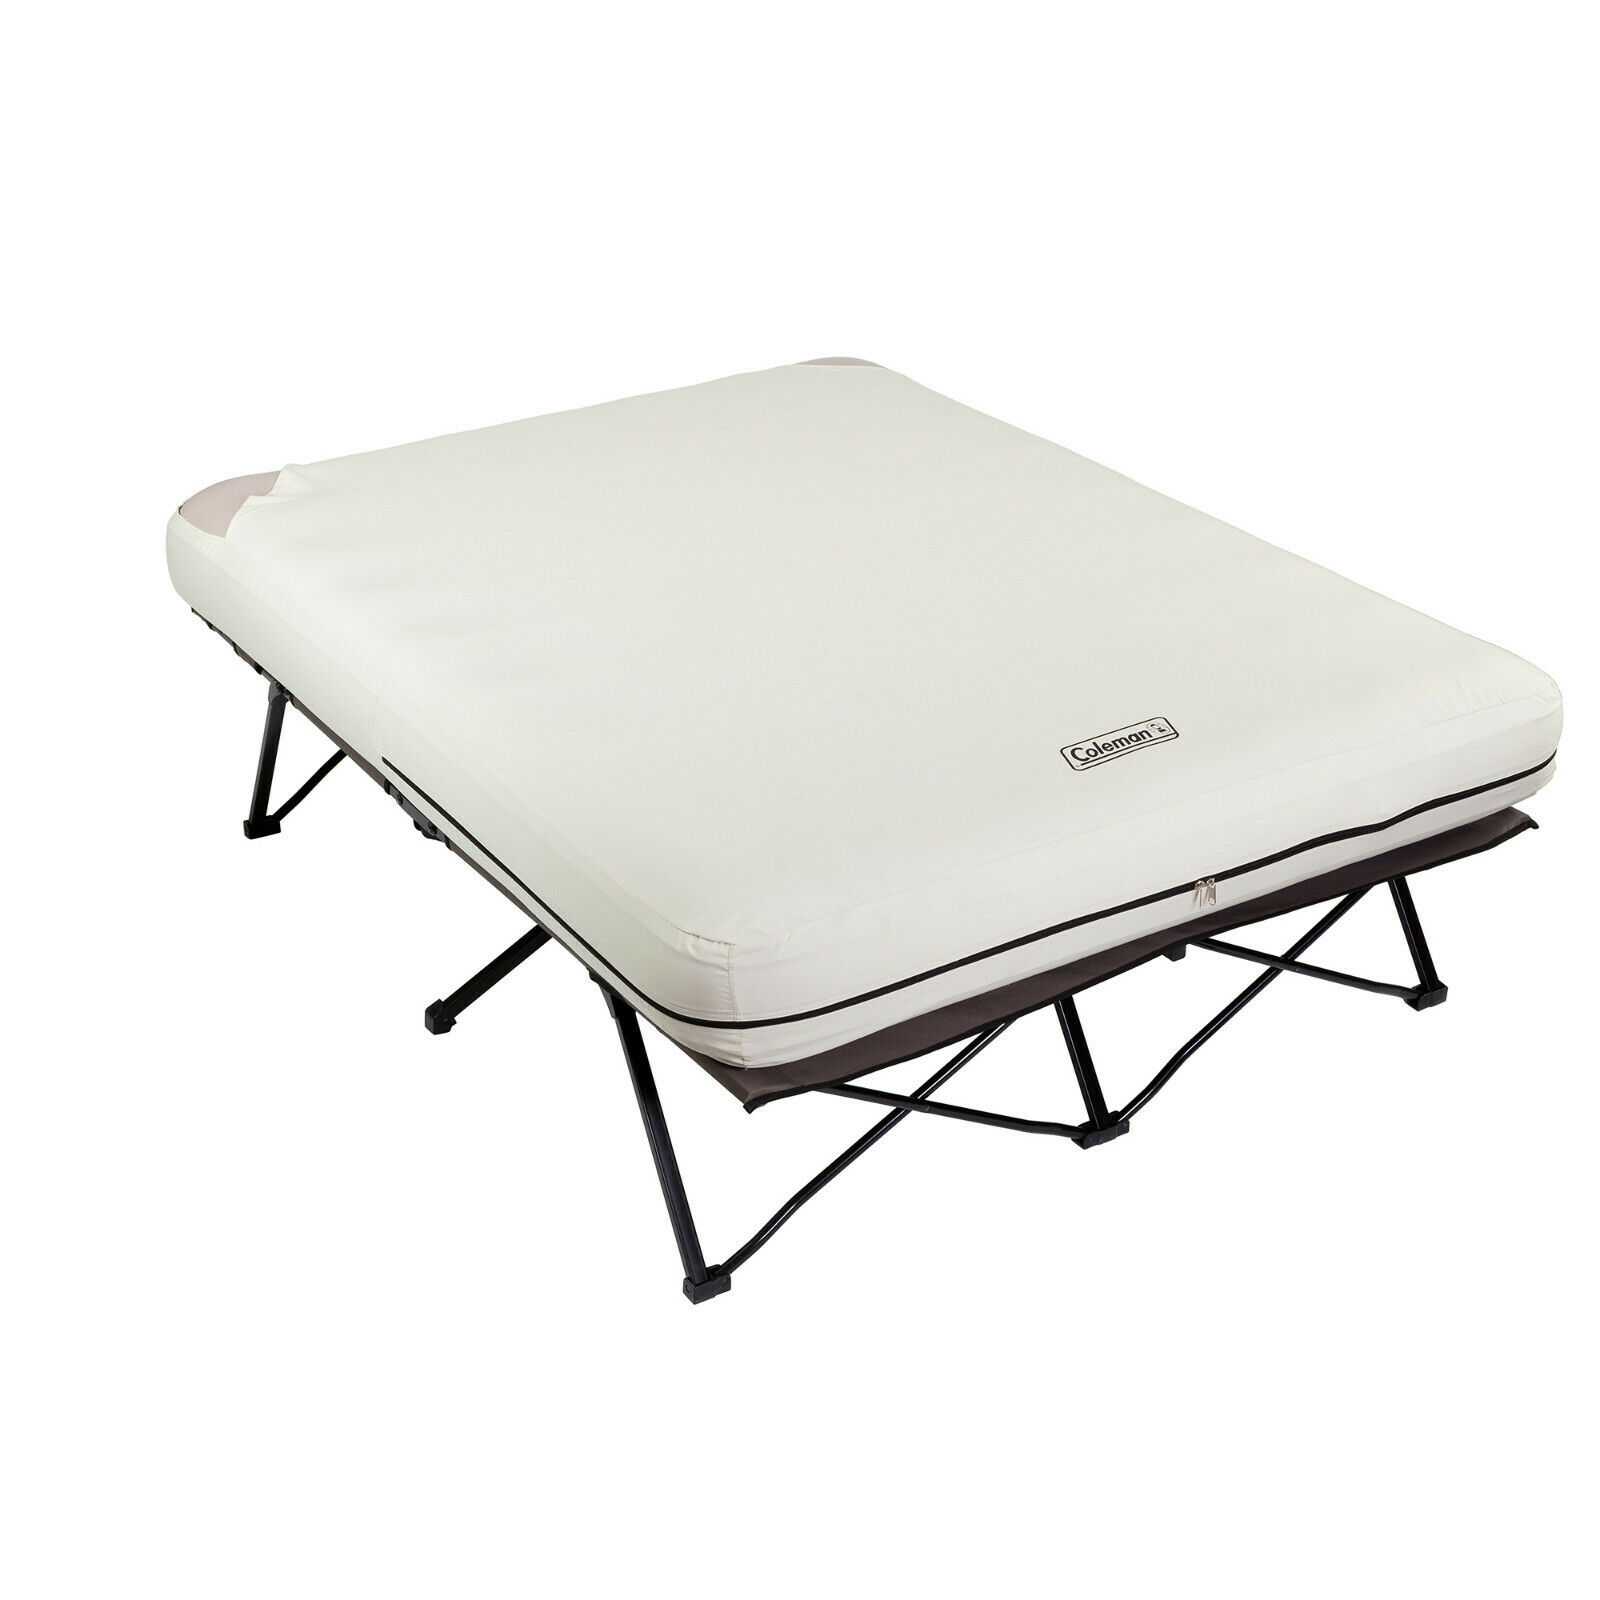 Coleman Queen Größe Folding Camp Cot Air Matratze Bed Camping Pump Side Tables